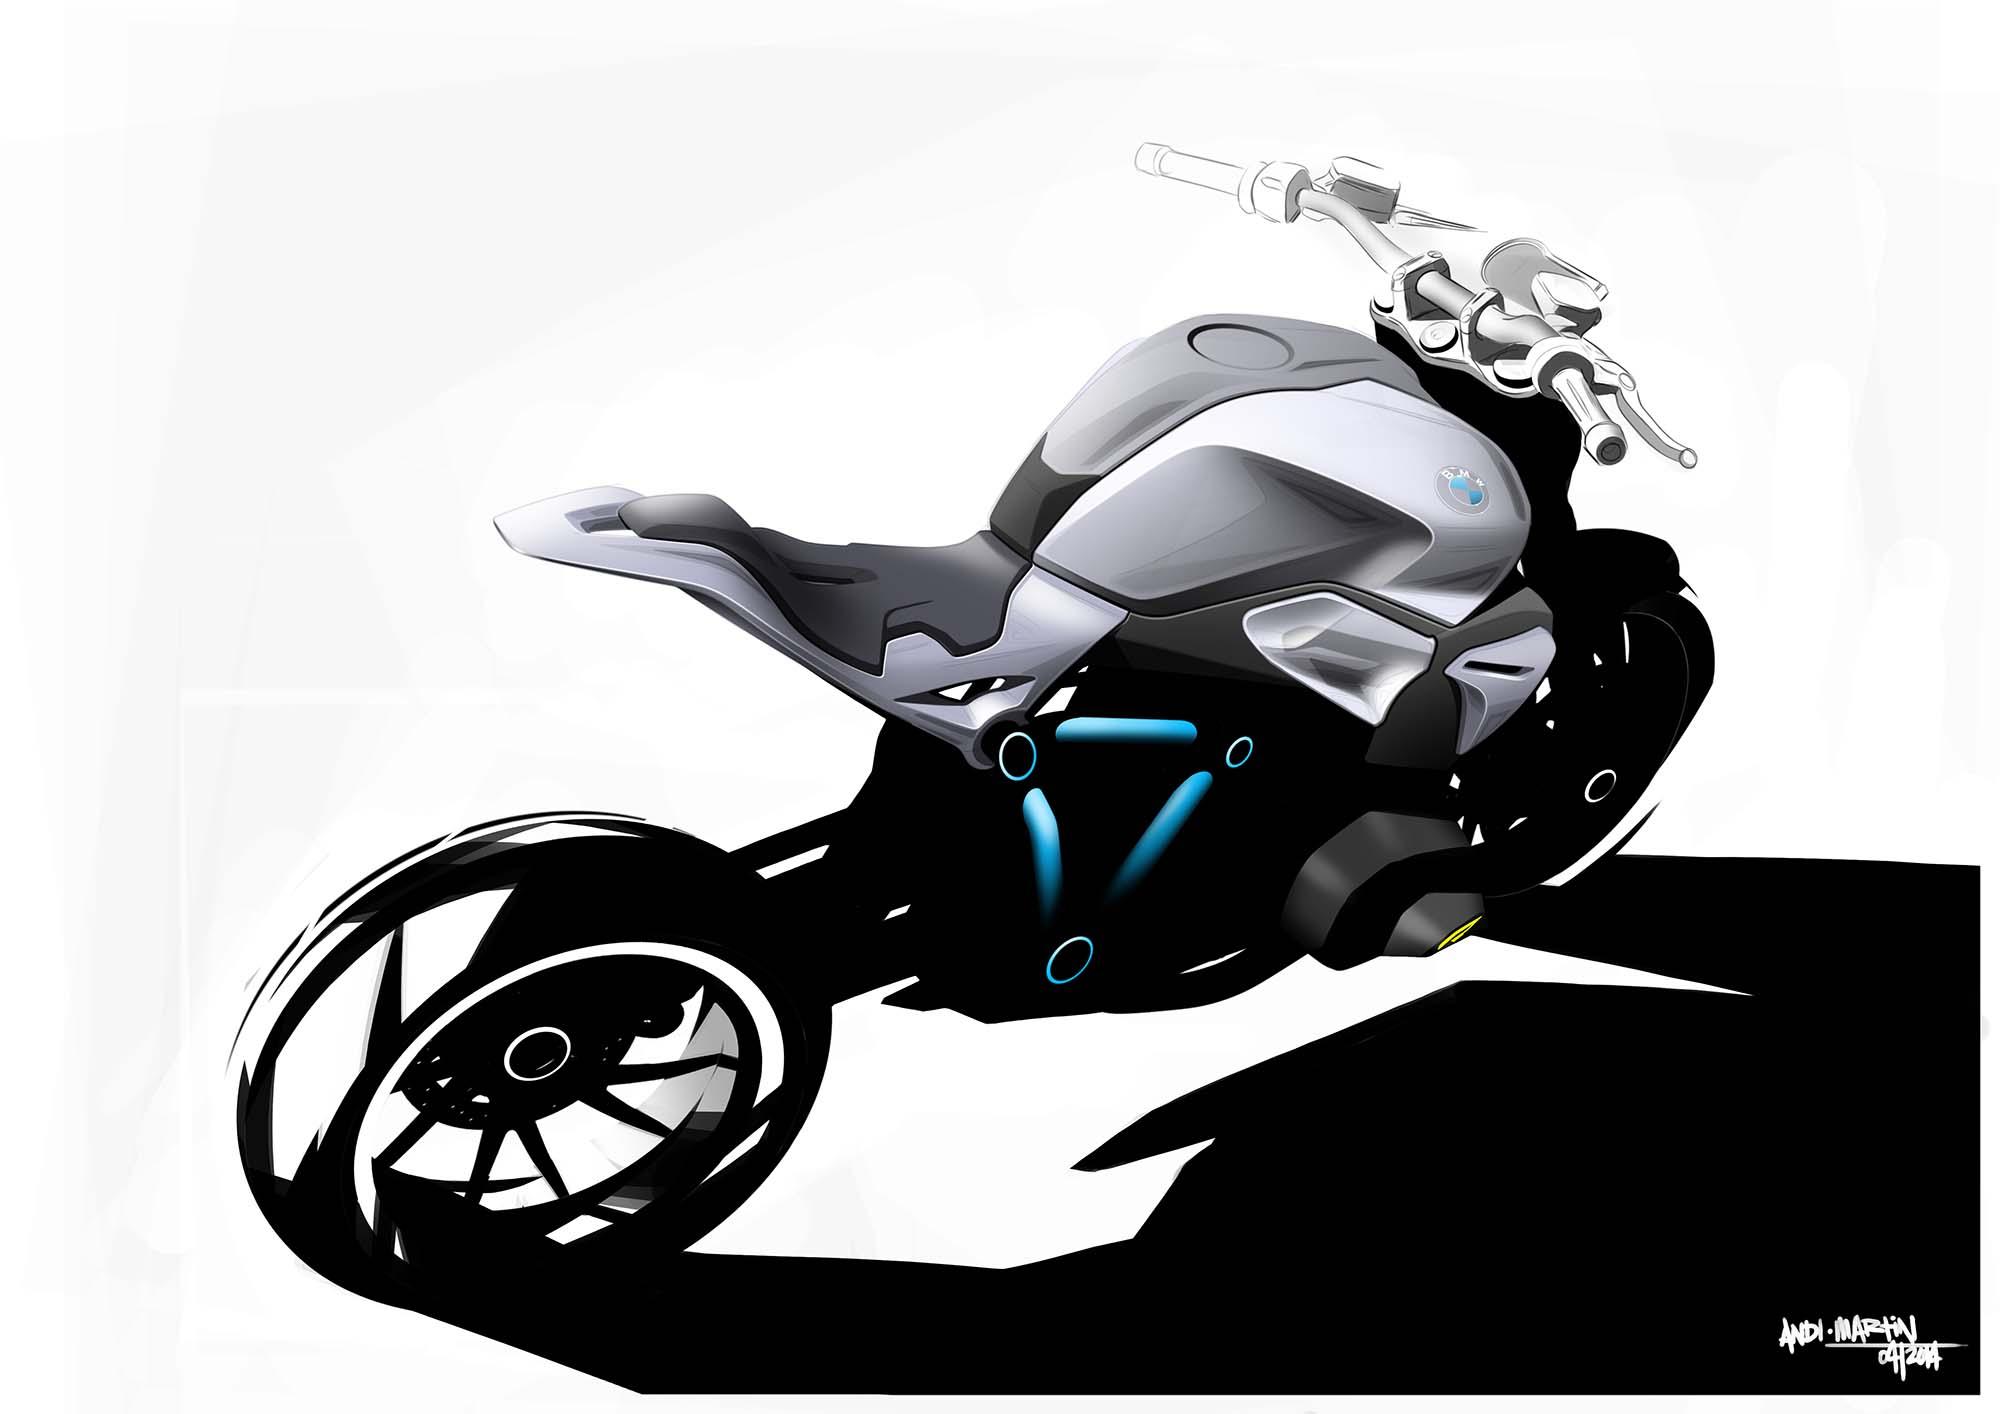 20141127_BMW-Concept-Roadster-sketch-03.jpg